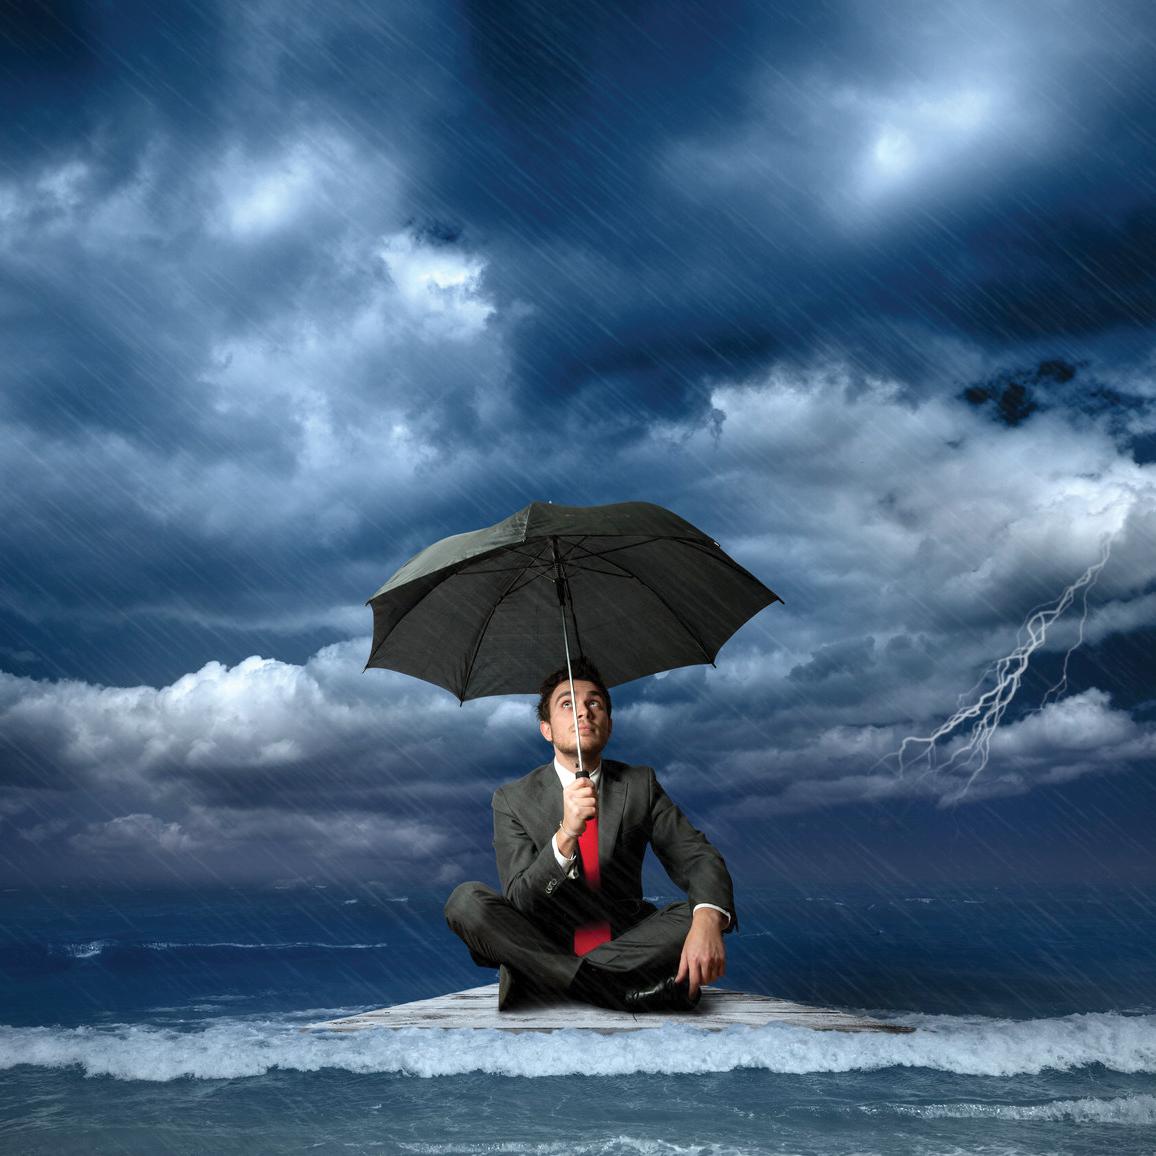 Rough Seas Ahead Taming and Navigating the Hard Insurance